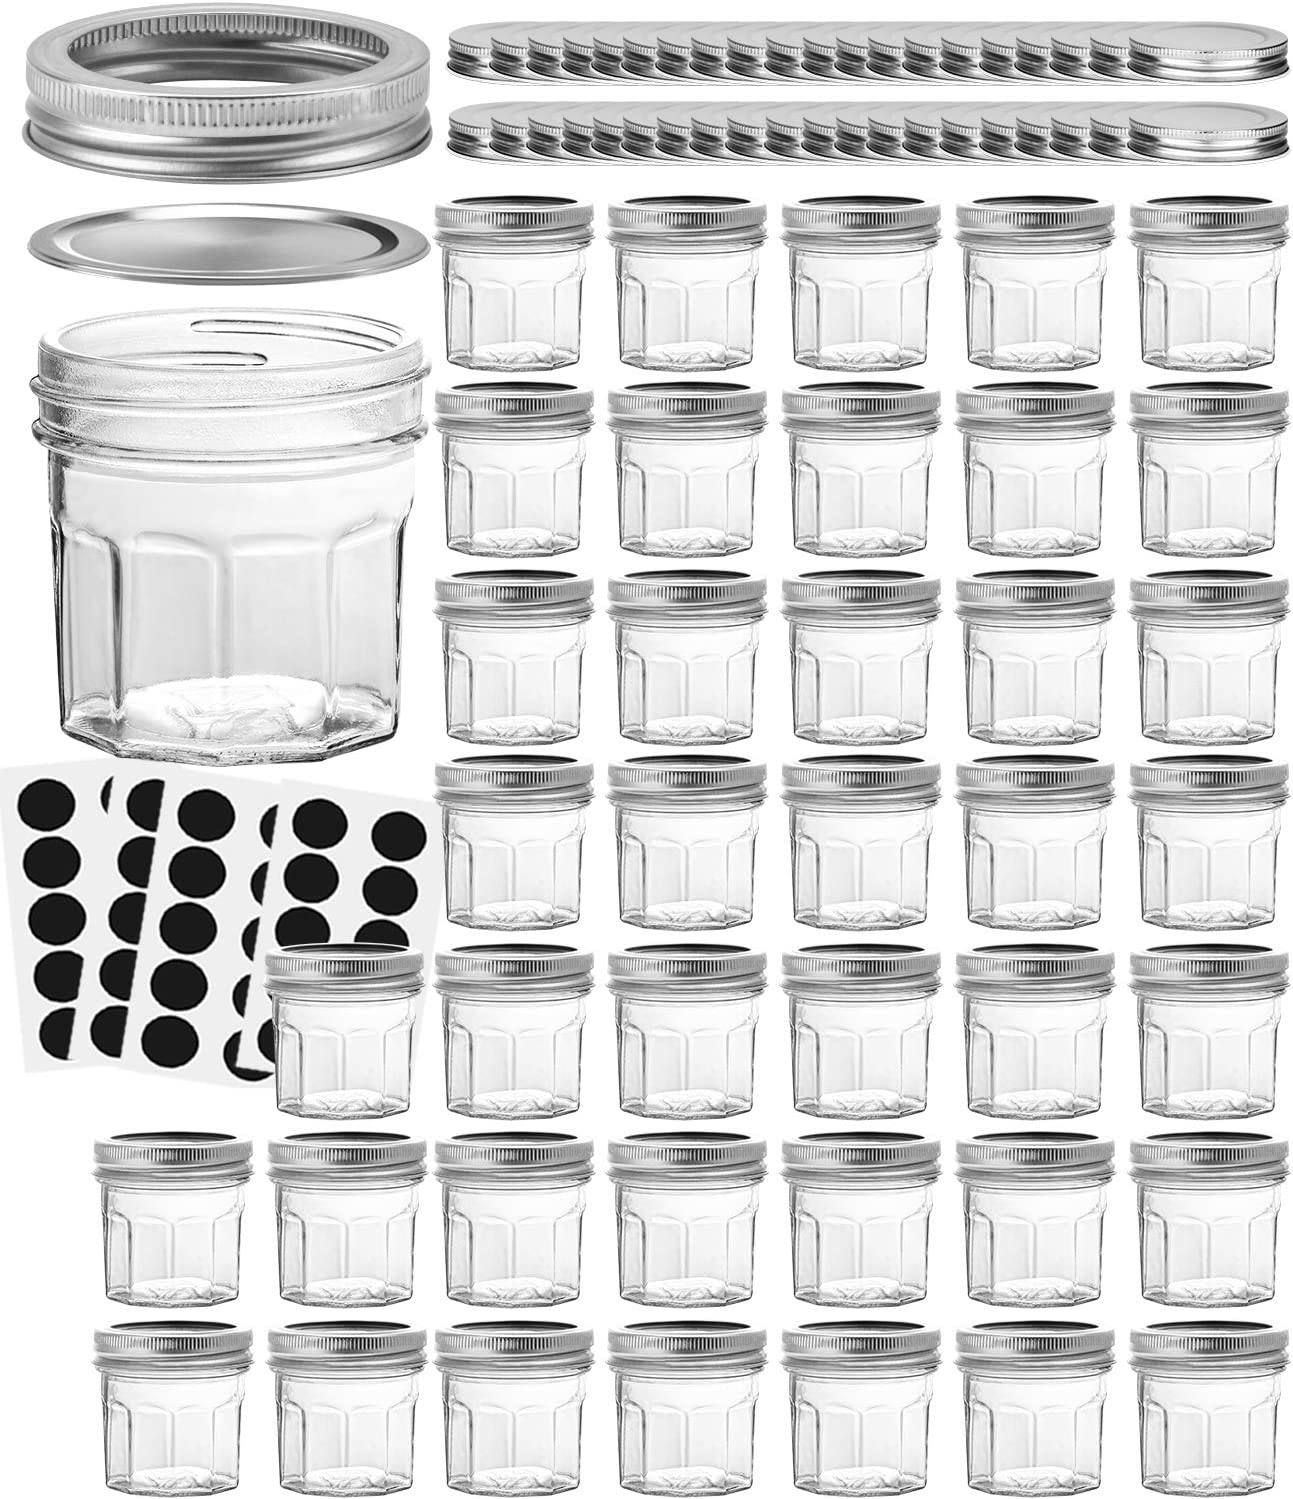 VERONES Mason Jars Canning Jars, 4 OZ Jelly Jars With Regular Lids and Bands, Ideal for Jam, Honey, Shower Favors, Baby Foods, DIY Magnetic Spice Jars, 40 PACK,Extra 40 Lids